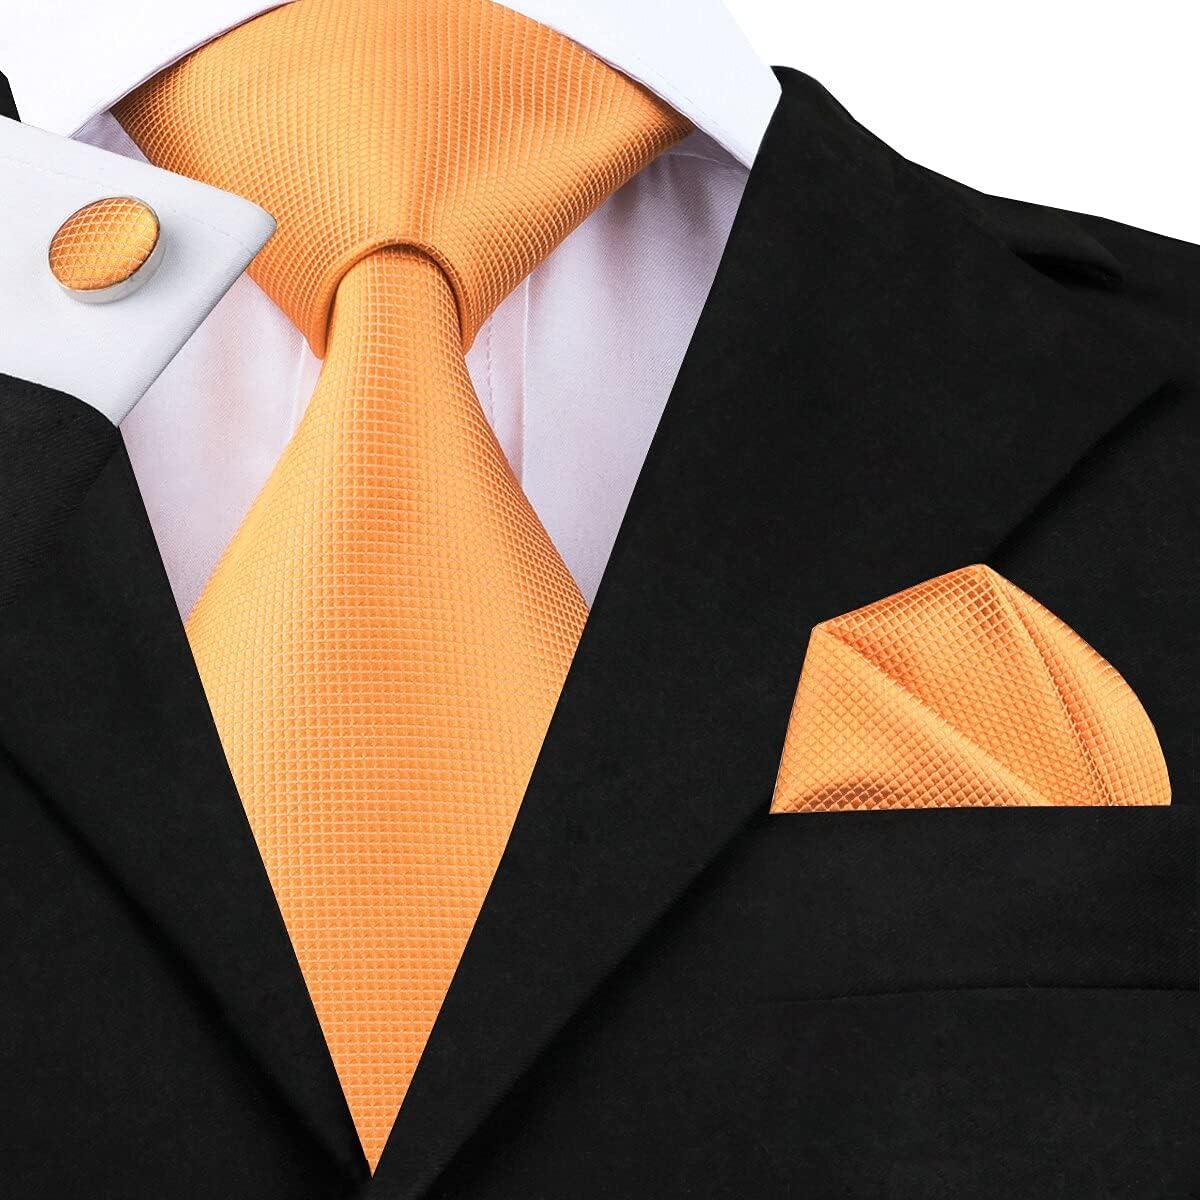 8.5cm Men Tie Solid Orange Neck Ties Set Boutonniere Pocket Square Cufflink Gift Box for Wedding Party Suit Cravat